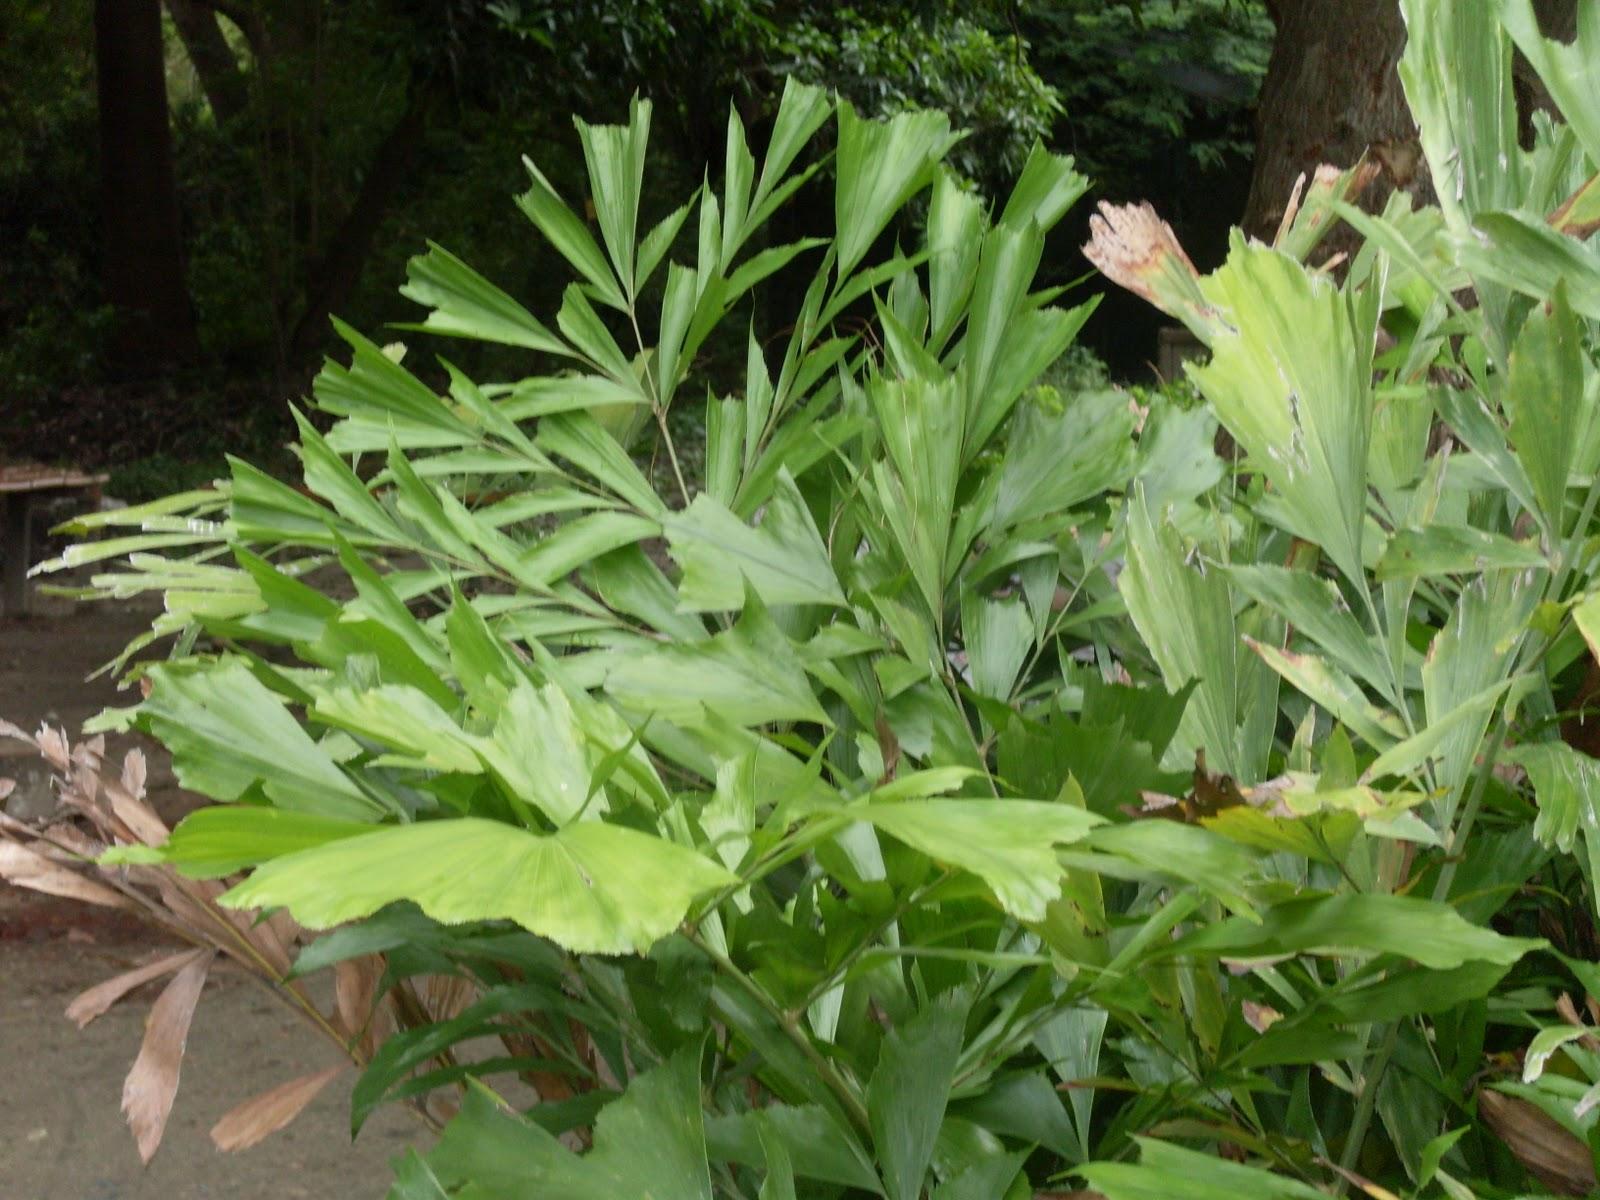 Plantas ornamentales for Plantas ornamentales wikipedia